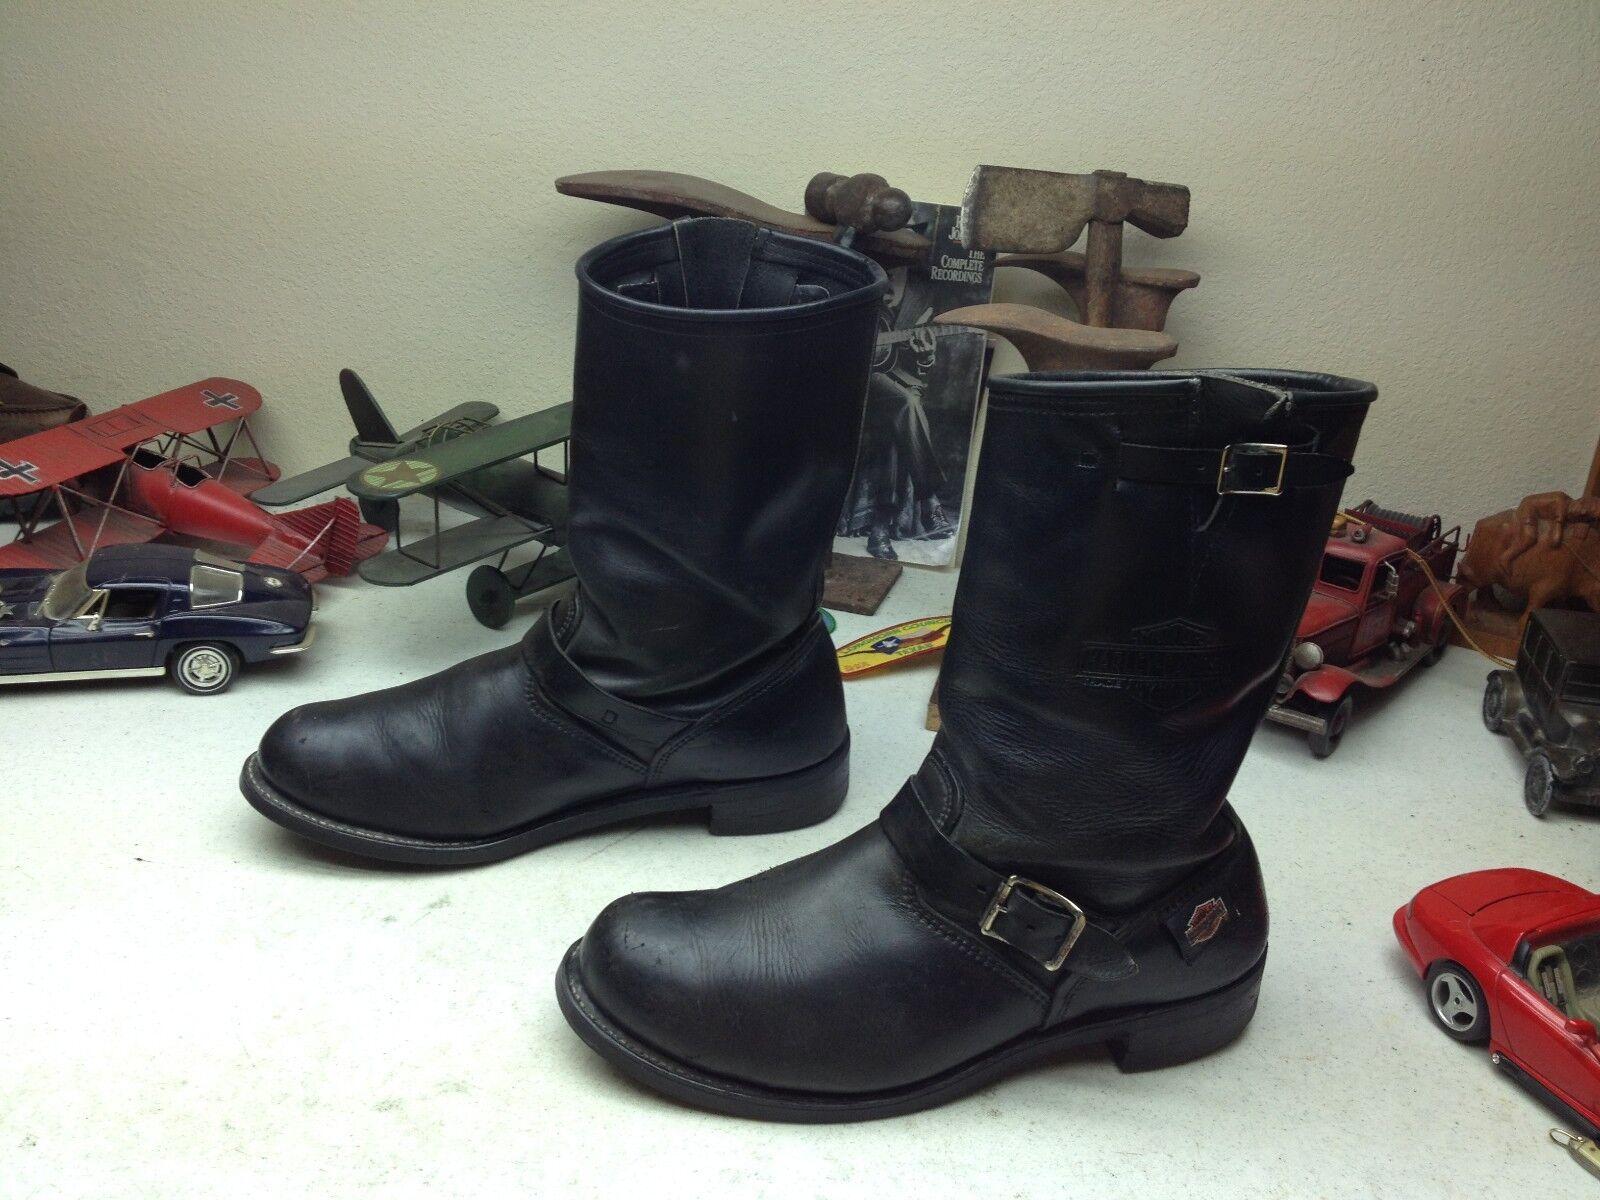 VTG HARLEY-DAVIDSON USA schwarz LEATHER MOTORCYCLE ENGINEER BOSS BIKER Stiefel 12 D